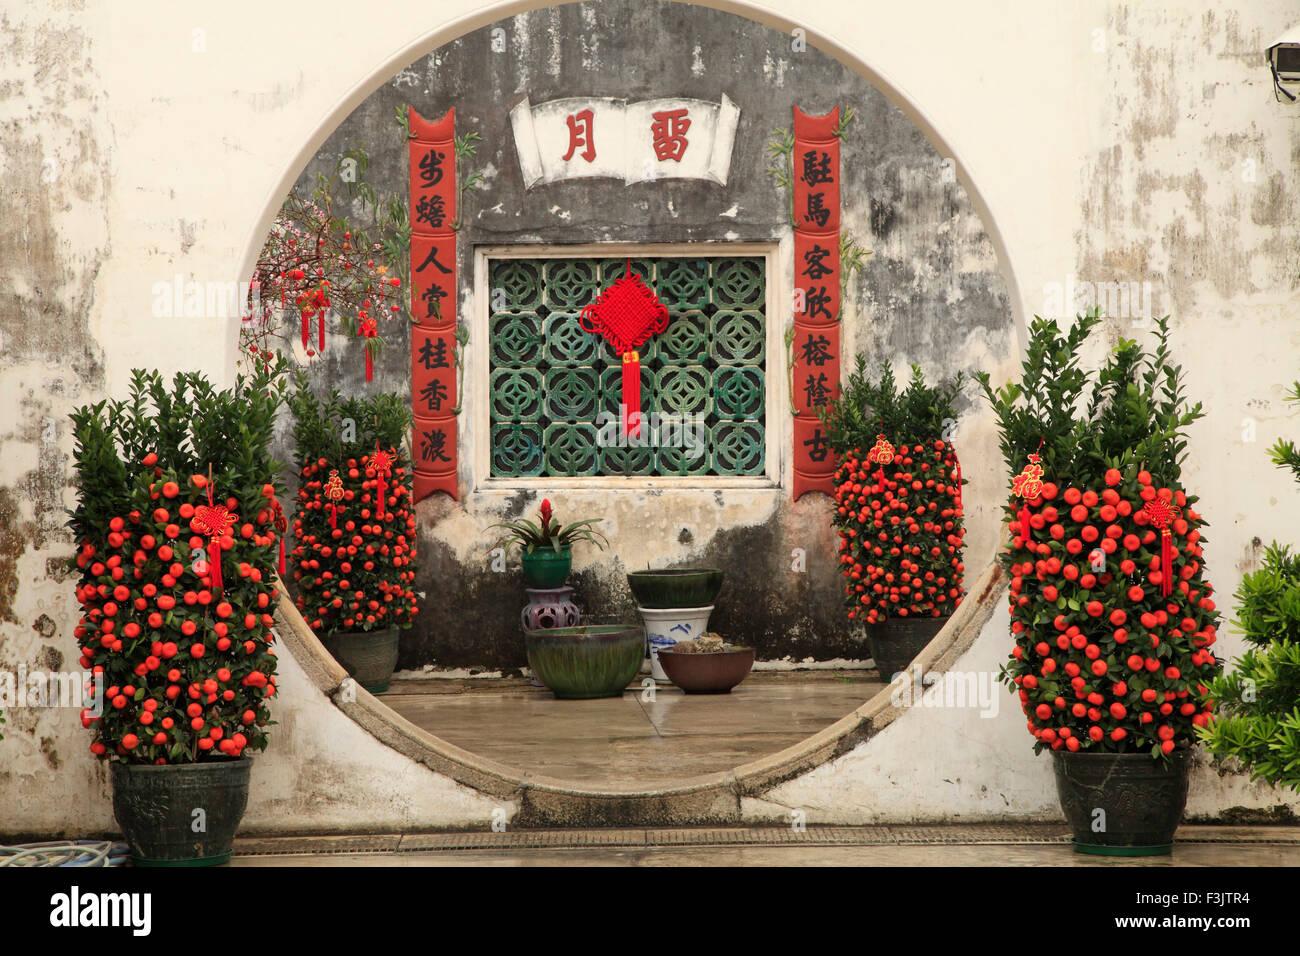 Cina, Macau, Mandarino's House, Immagini Stock